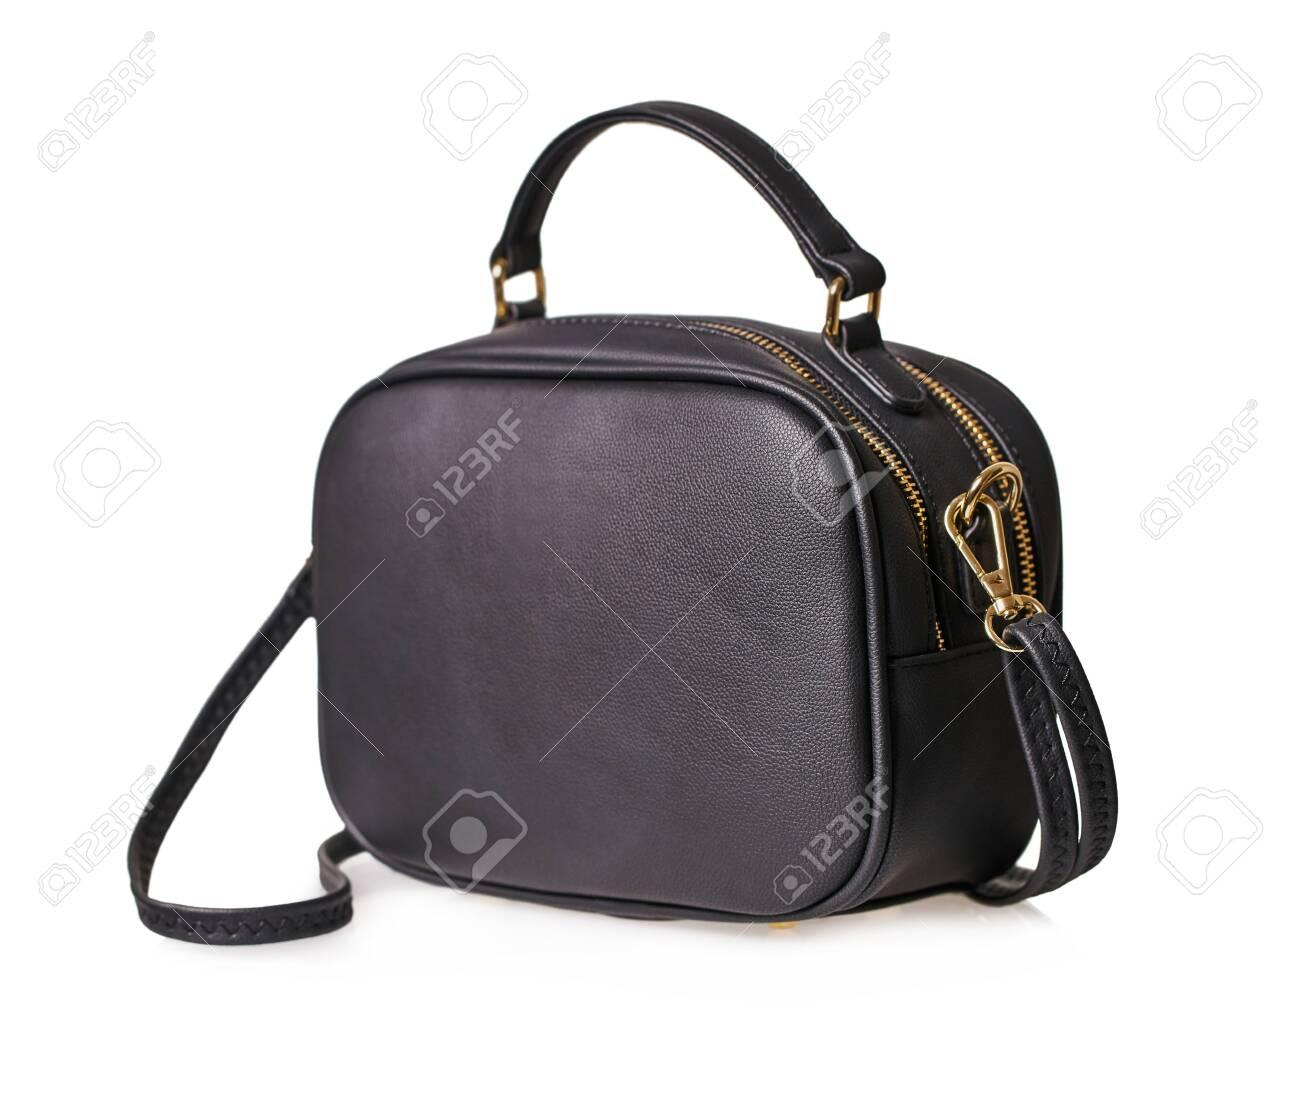 new women bag on white isolated background - 135701464